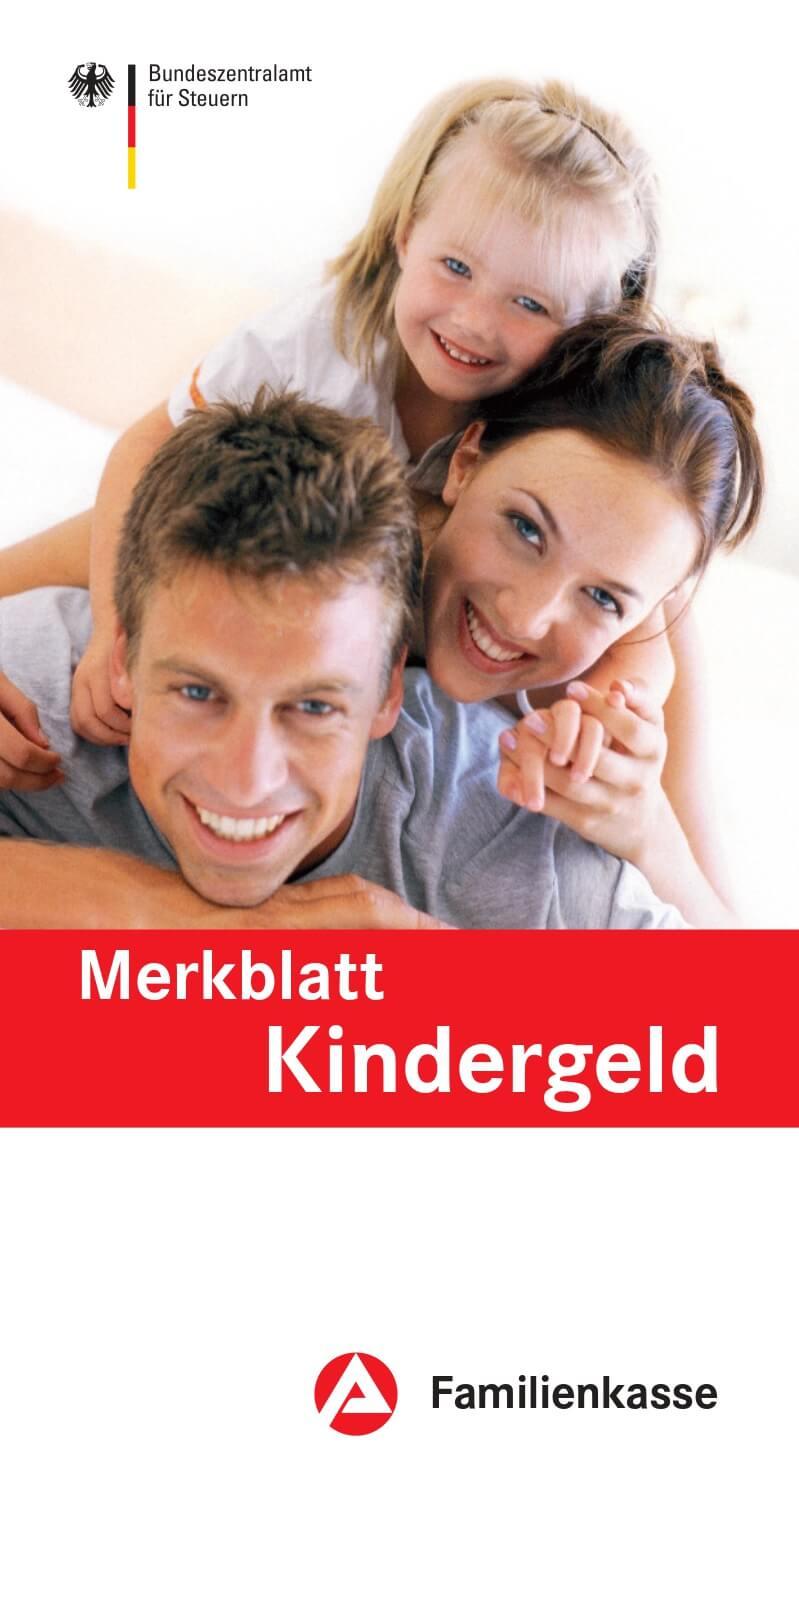 BMFSJ - Merkblatt Kindergeld